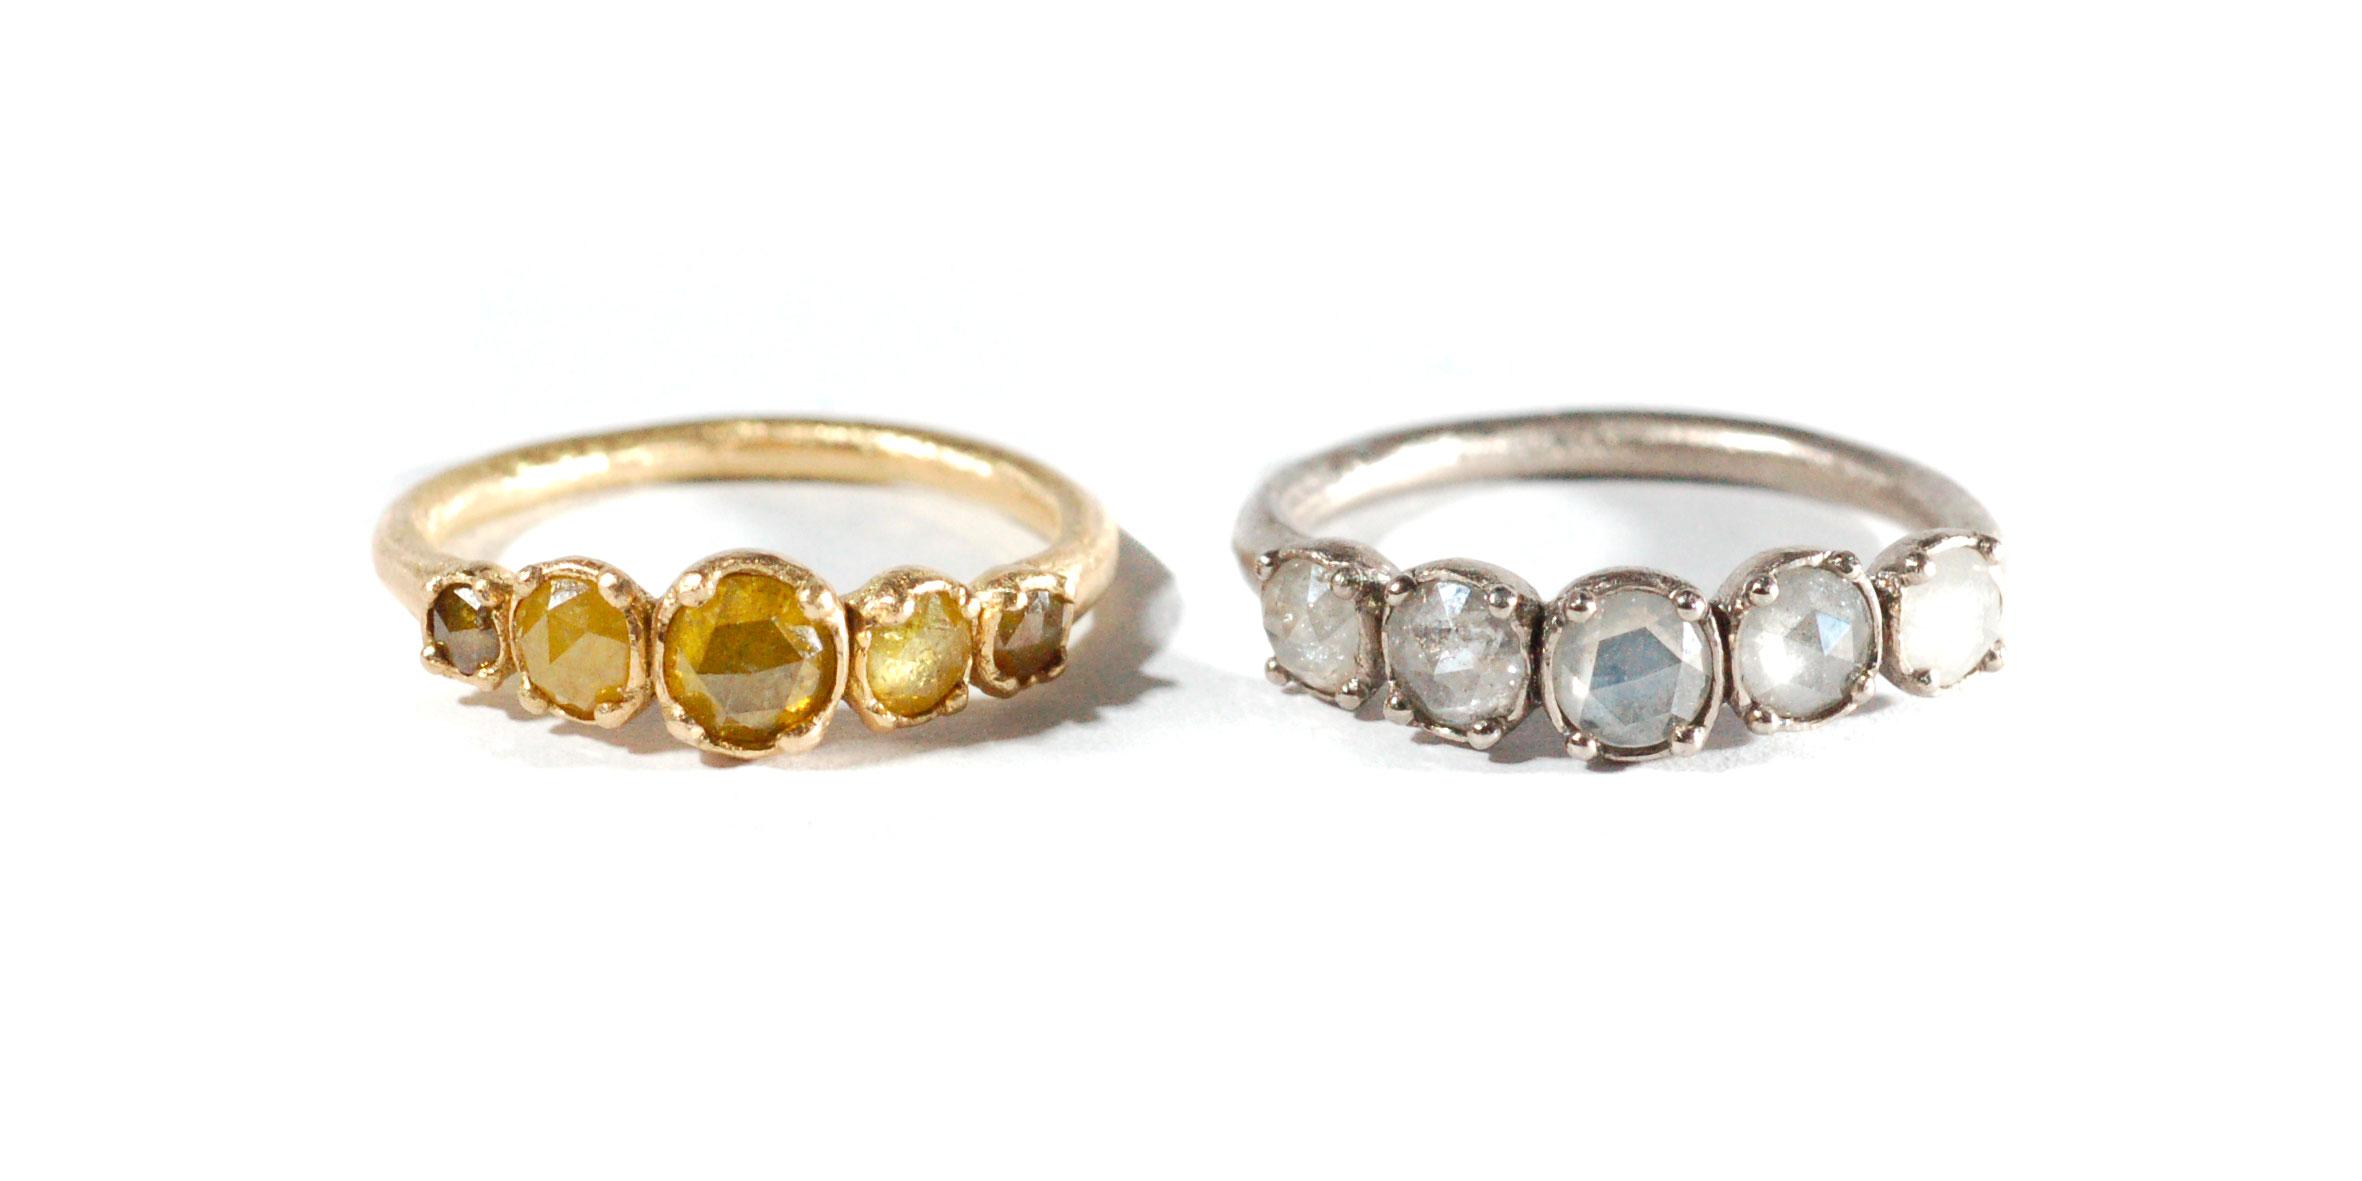 Opaque-Diamond-Rings.jpg